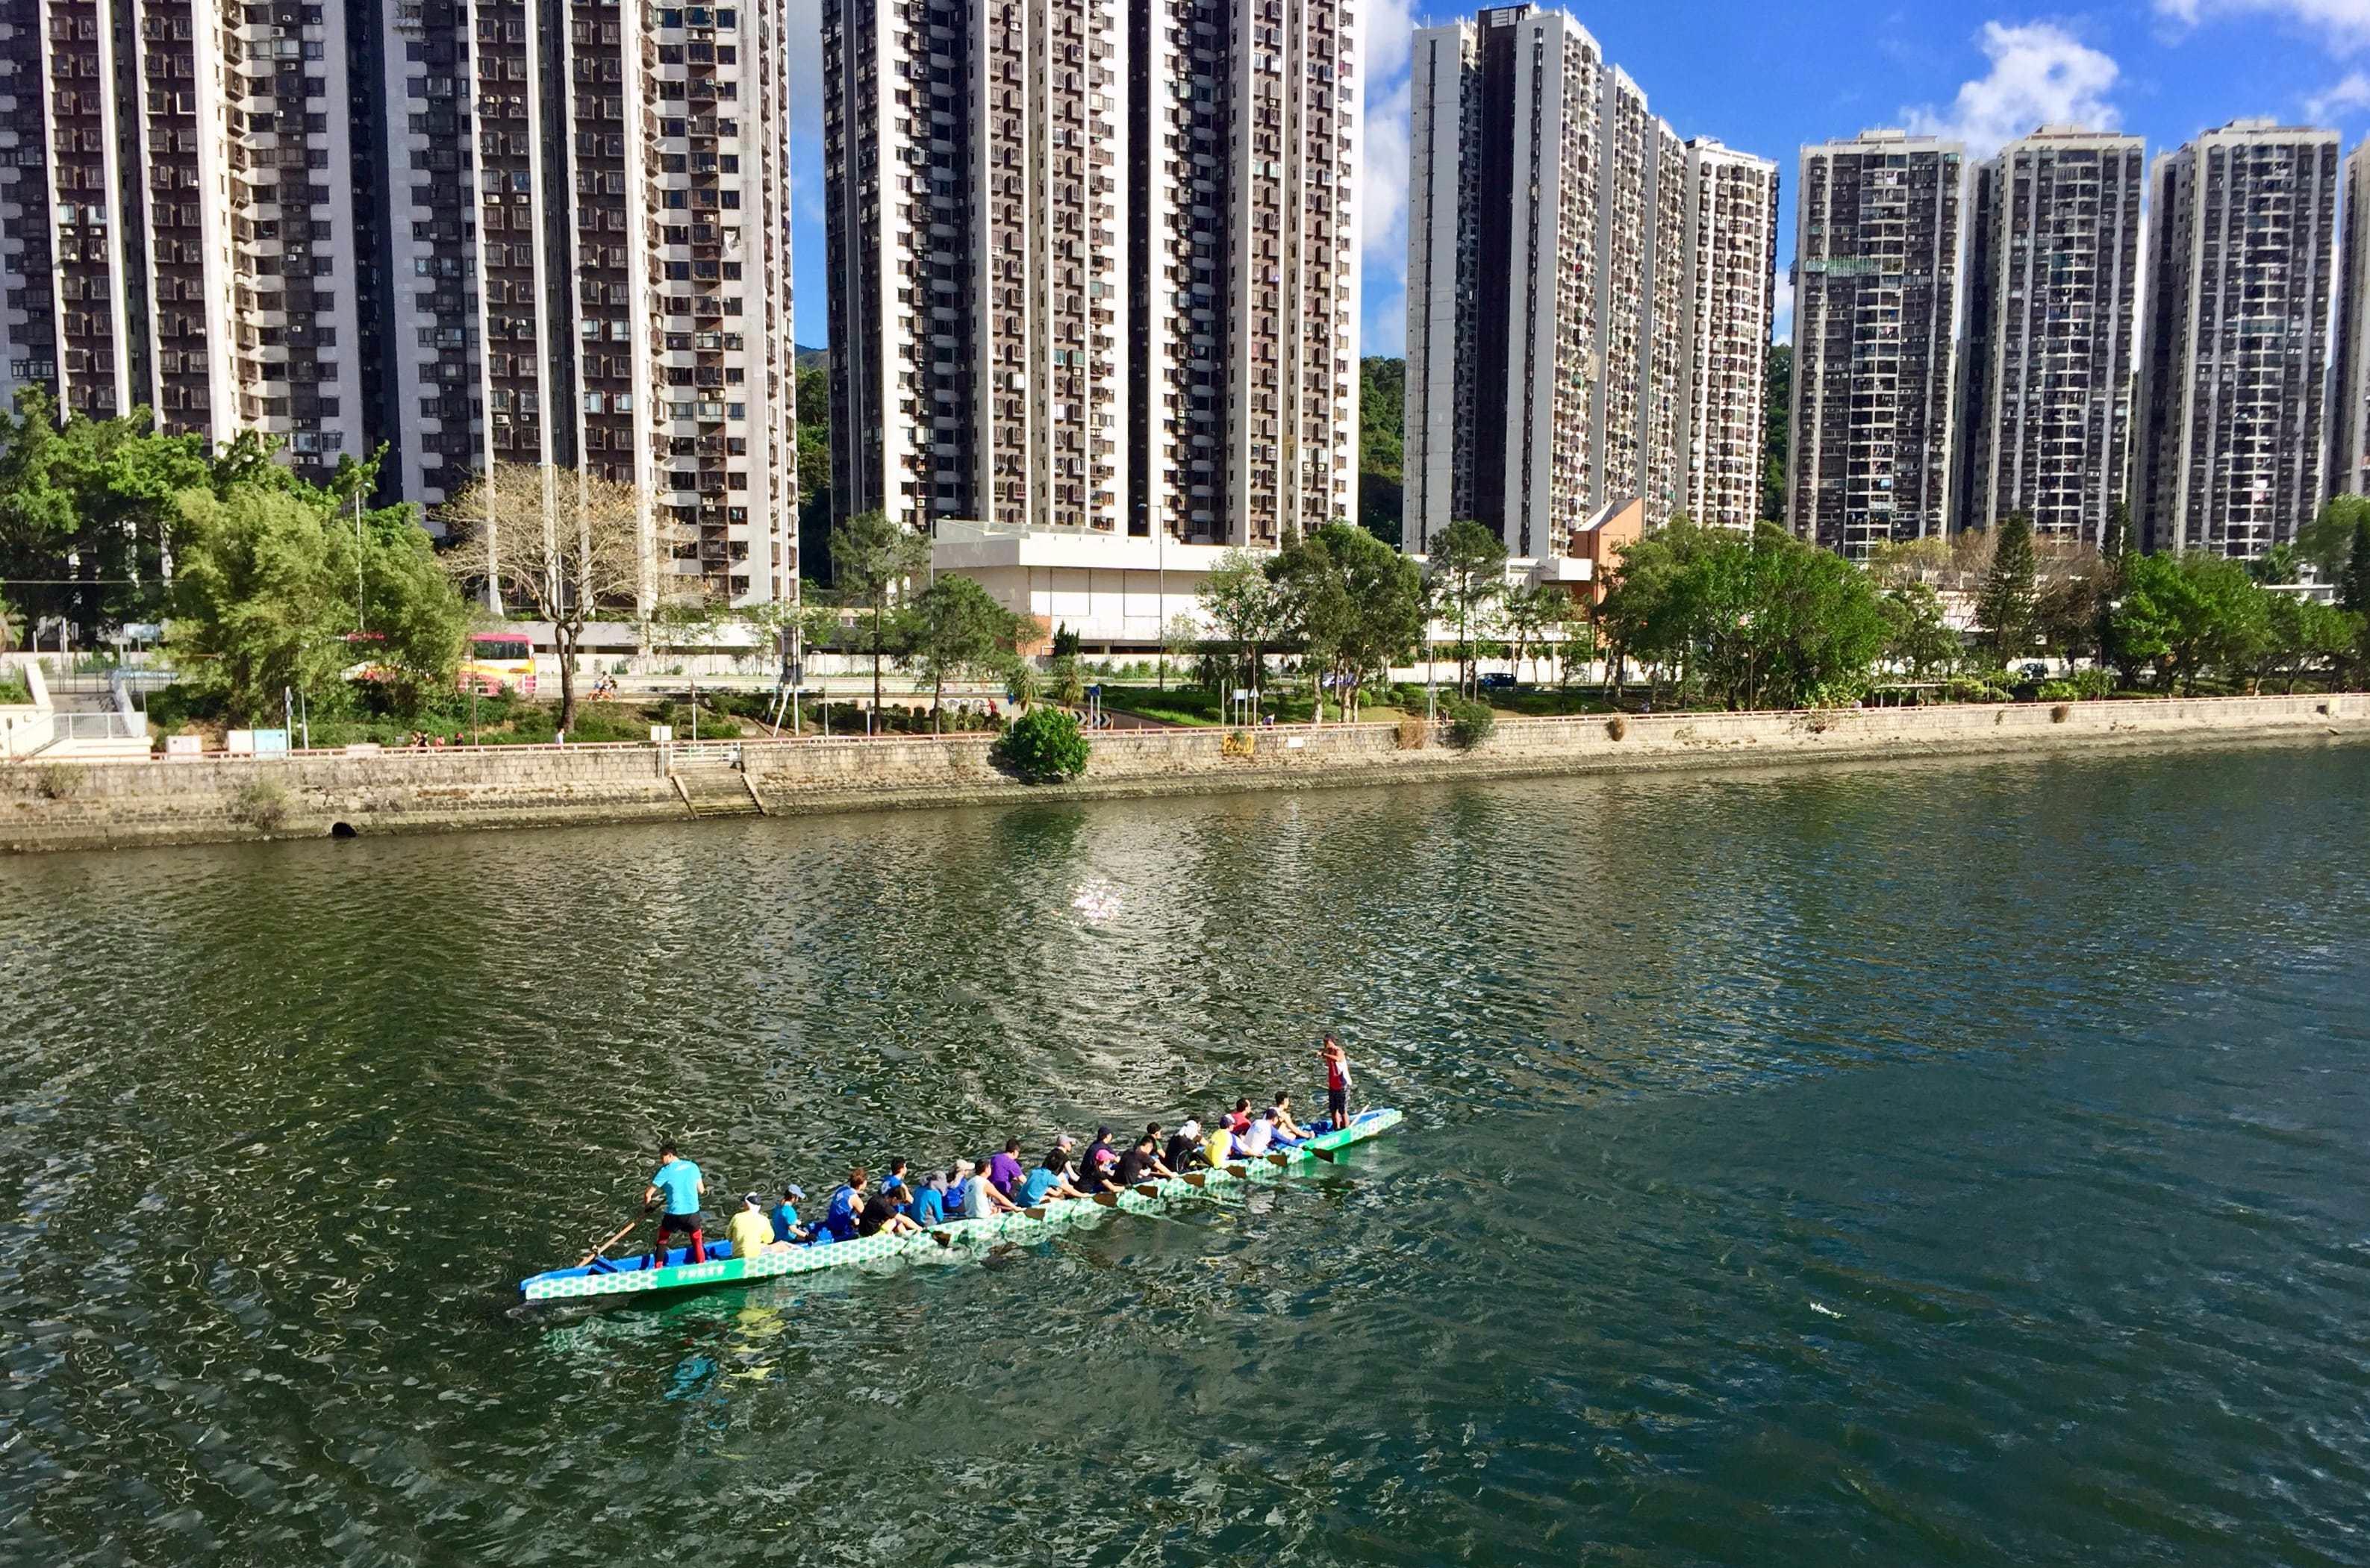 Dragon Boat rowers practising in the Shing Mun River